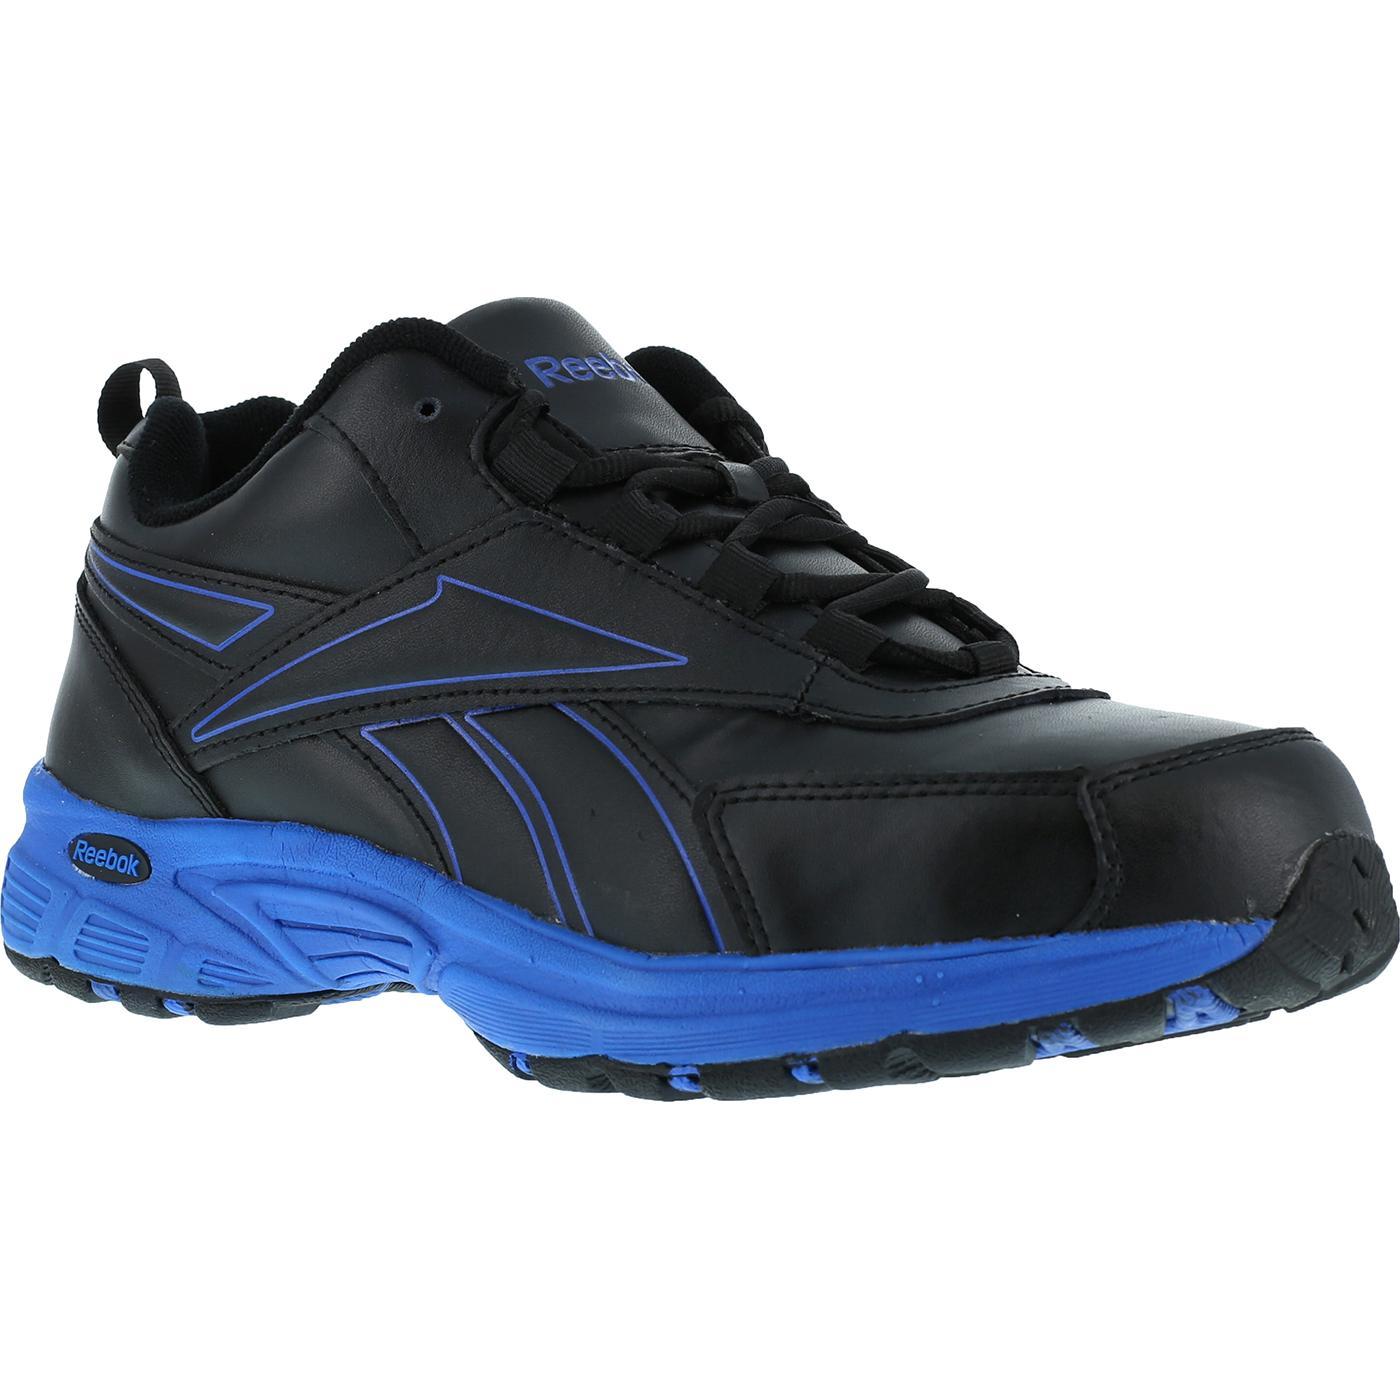 608fa6e2acd Men s Black Blue Steel Toe Work Athletic Shoe